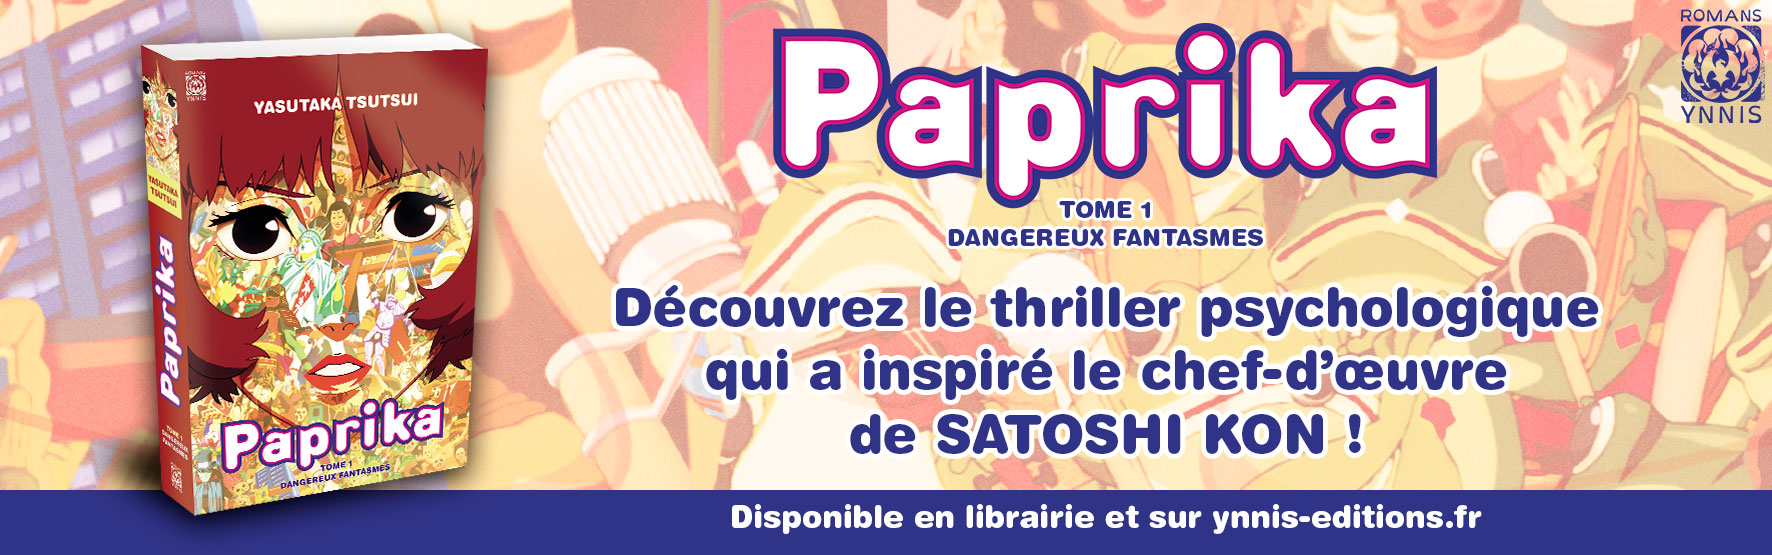 Paprika-header-amnshop